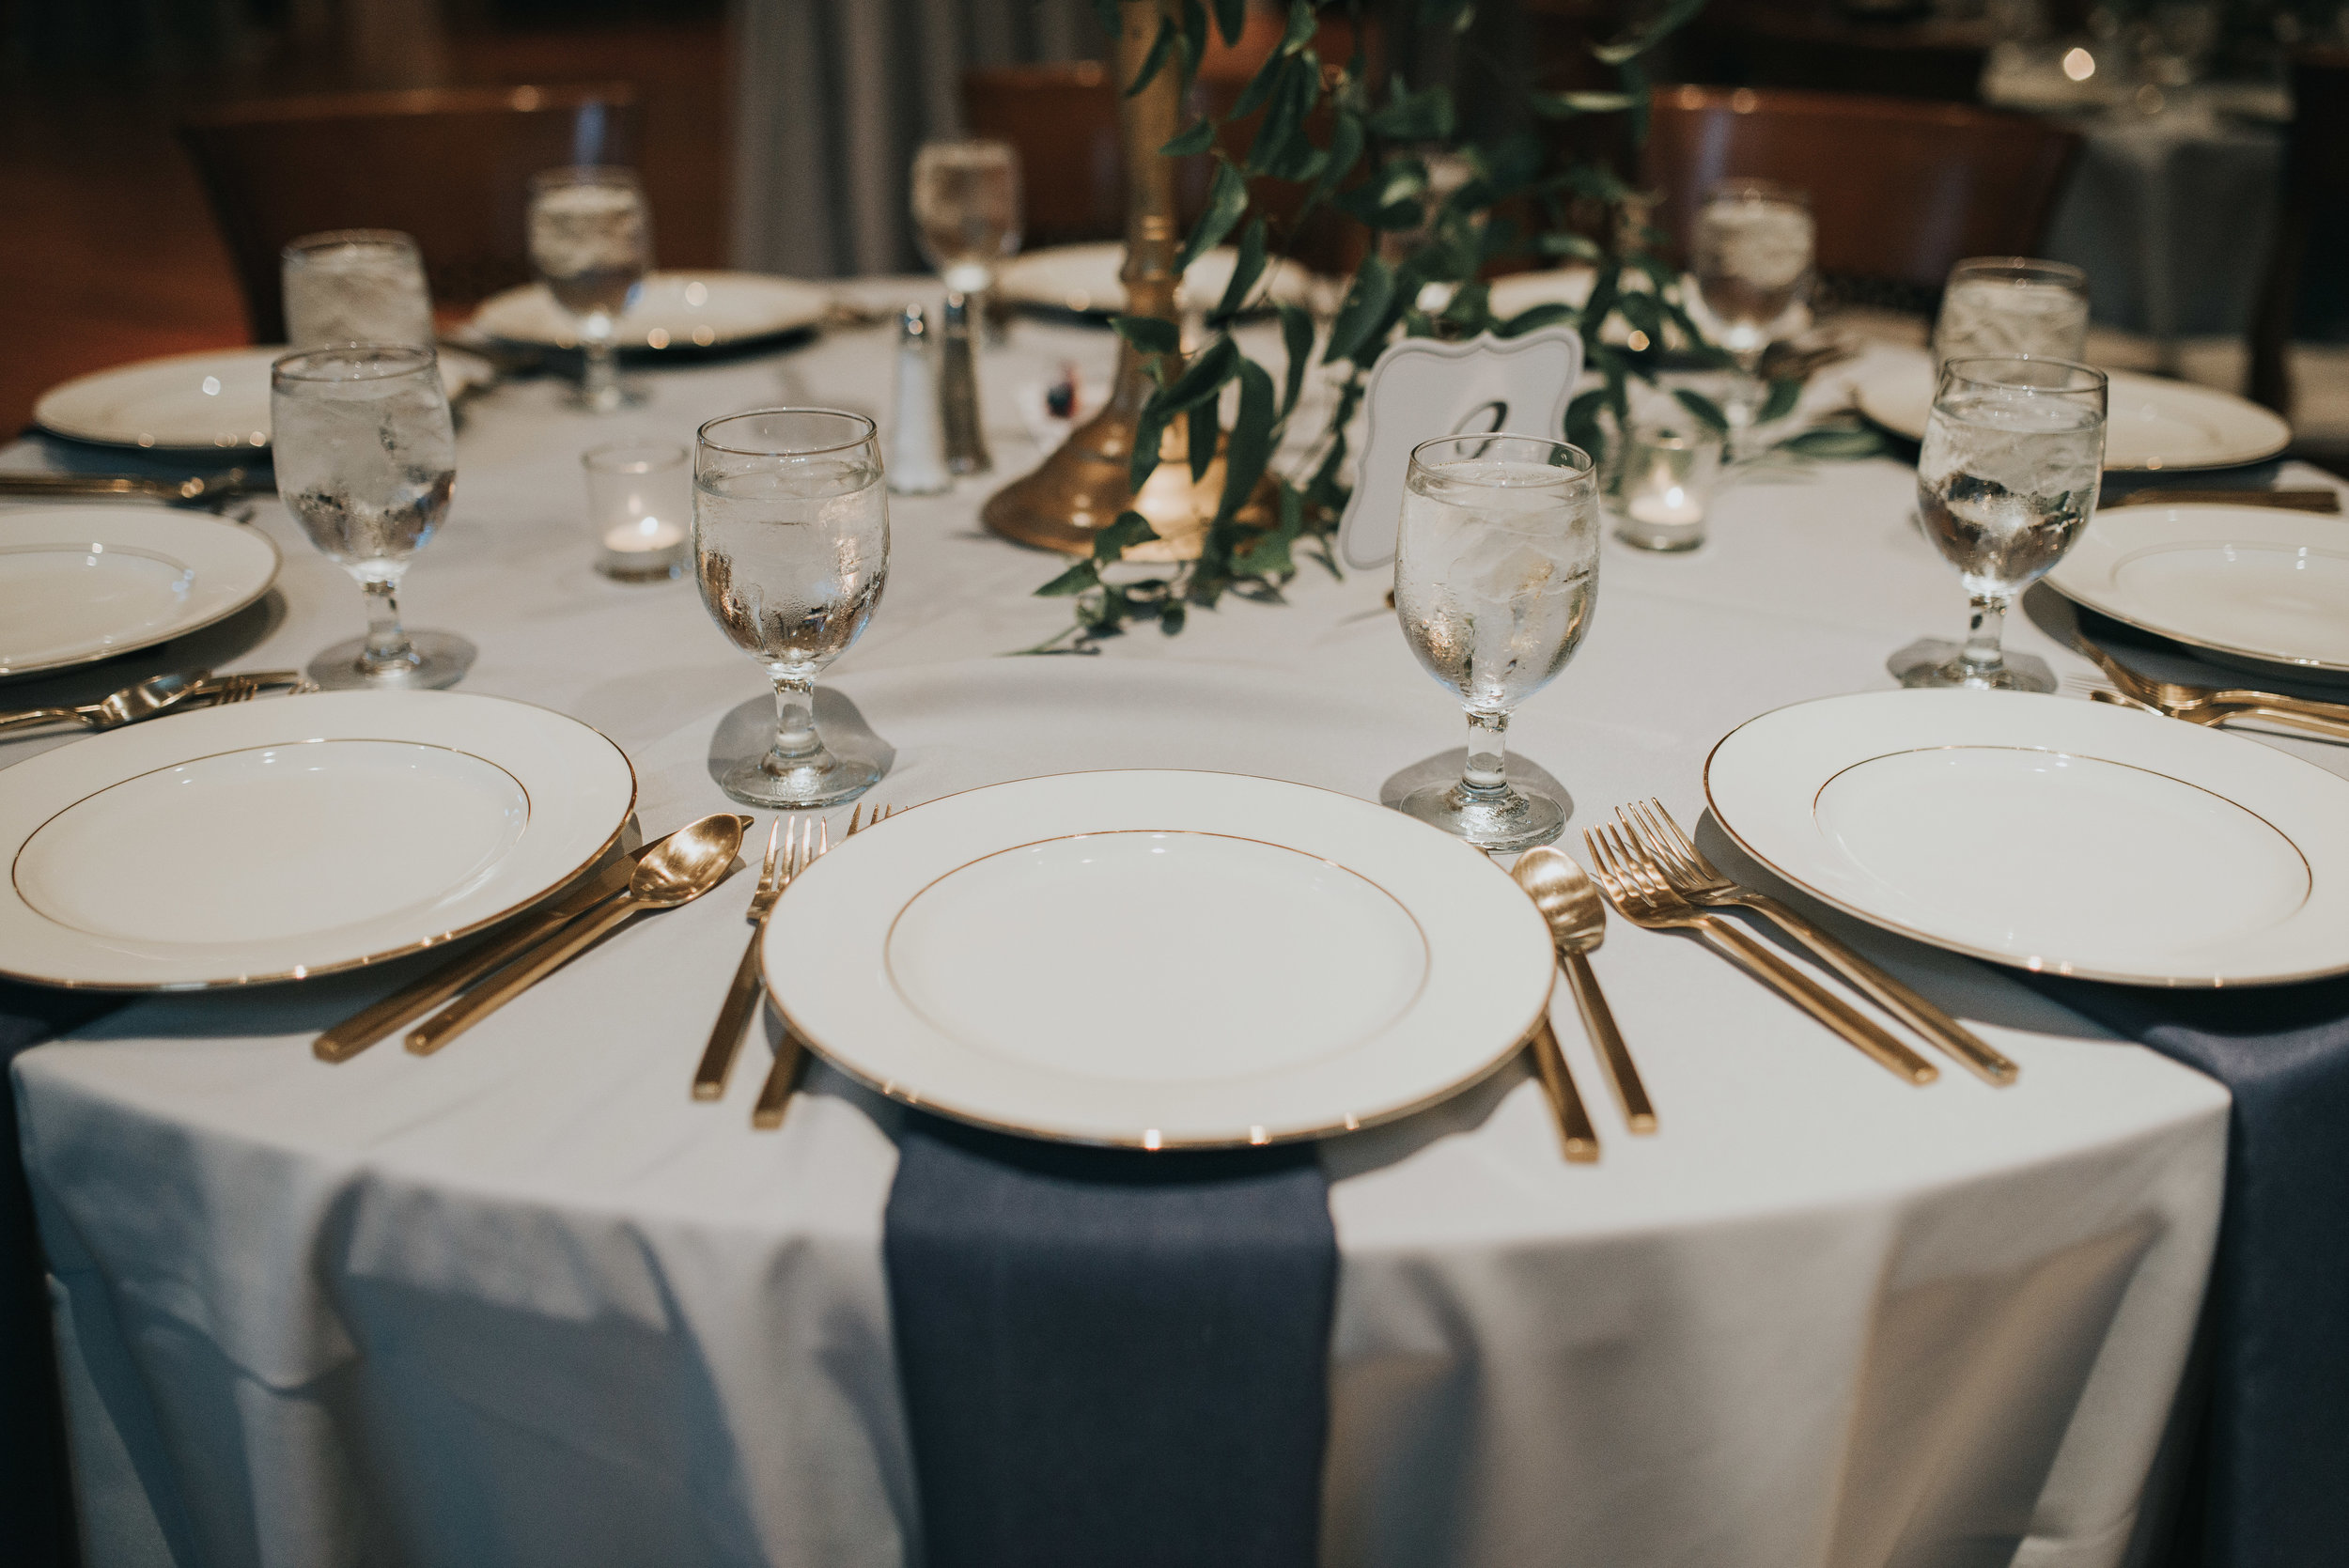 Navy and gold table place setting at Atlanta History Center